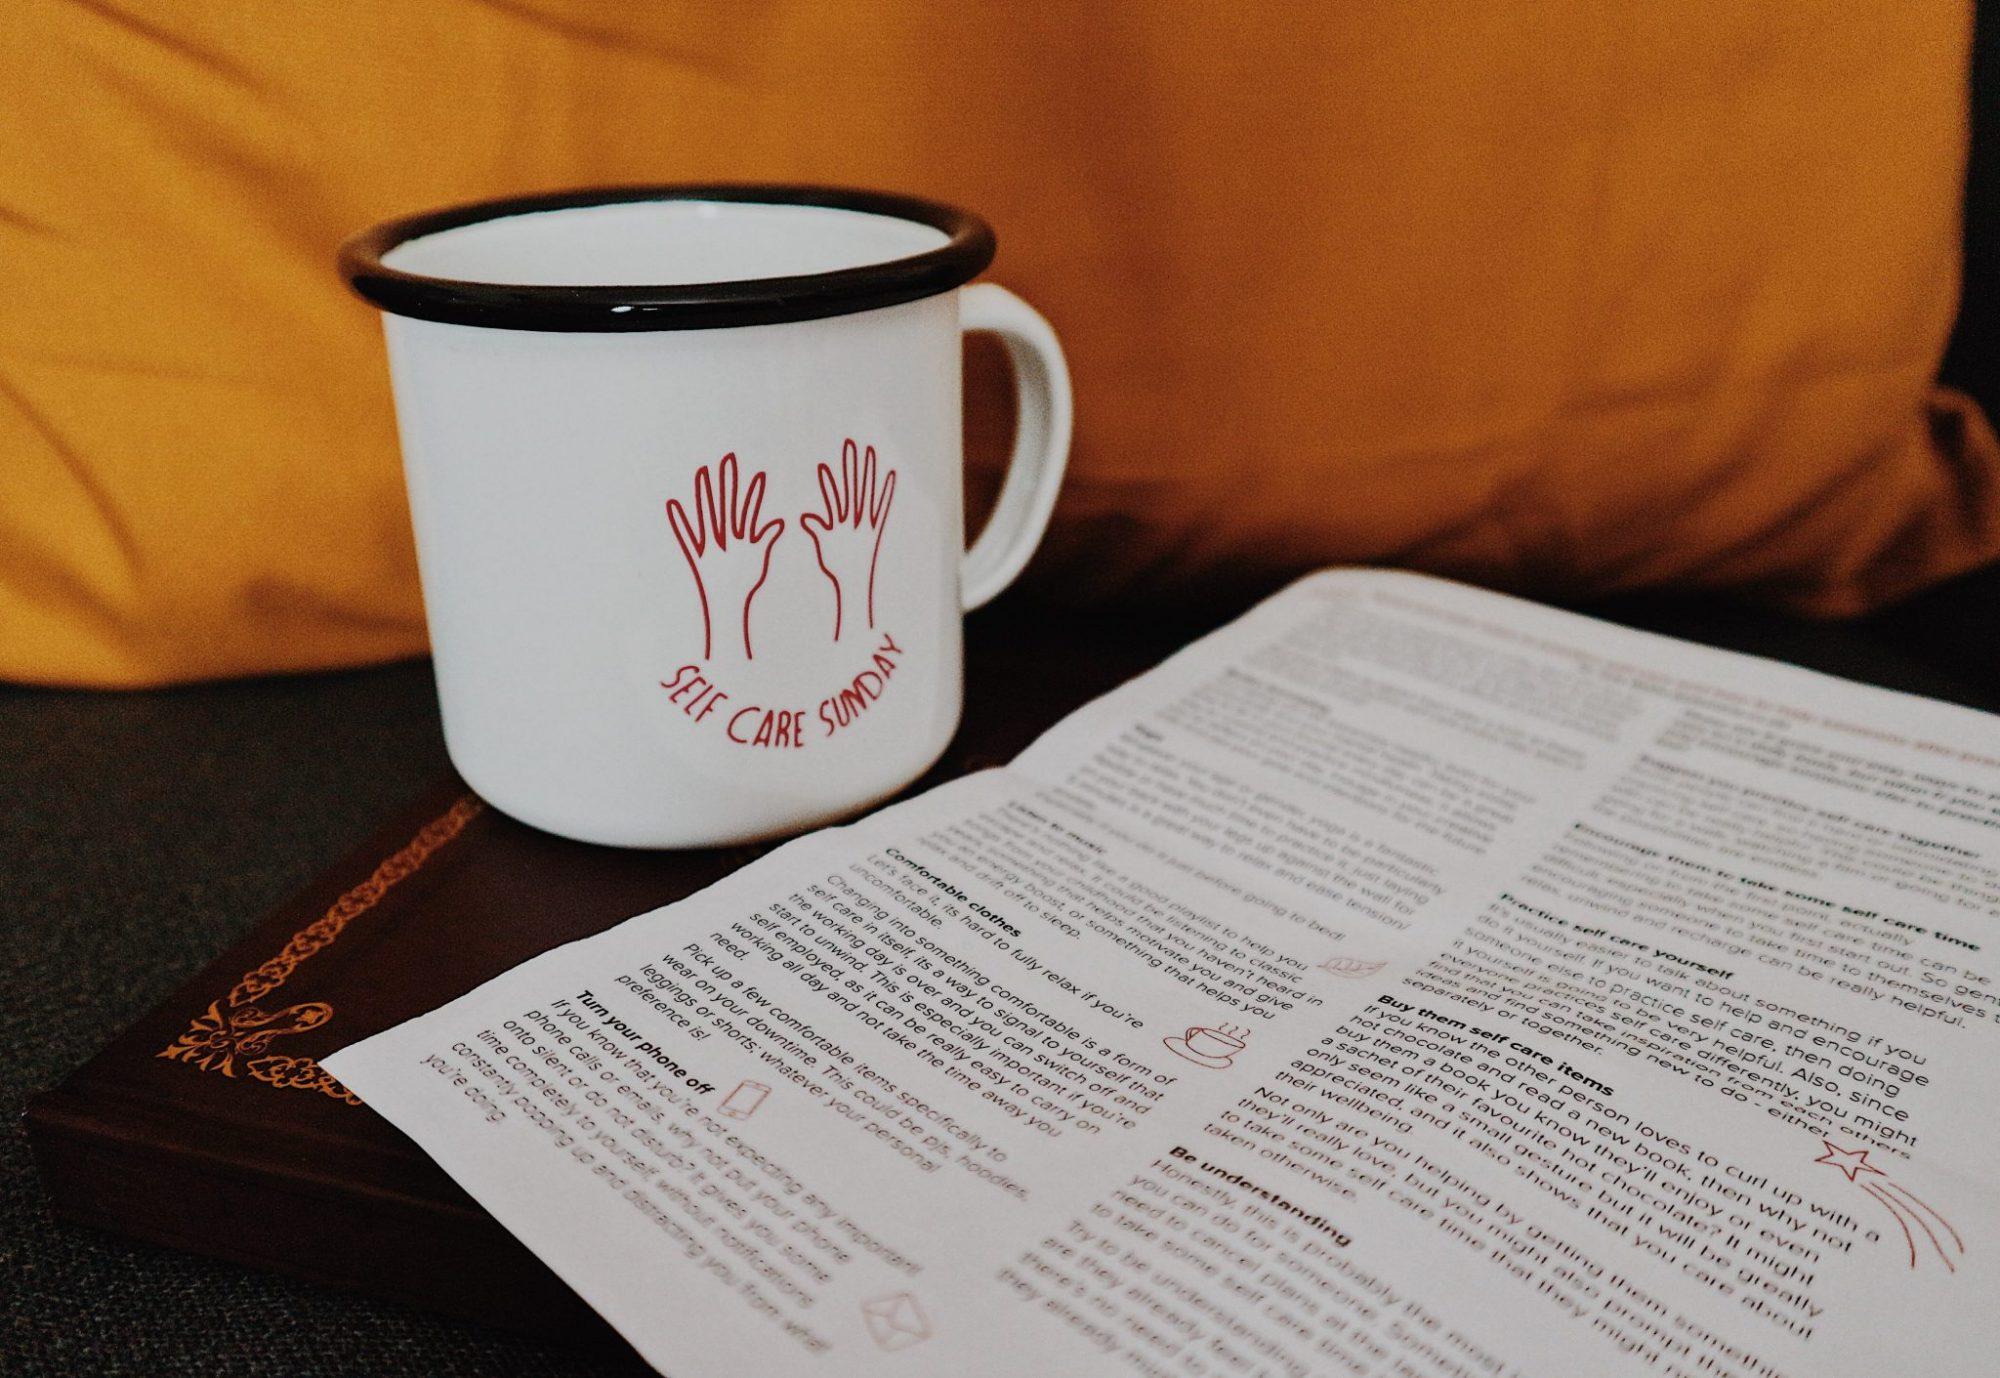 Self Care Sundays Mug | Sheffield Futures Self Care Tips List | Mustard Throw Pillow